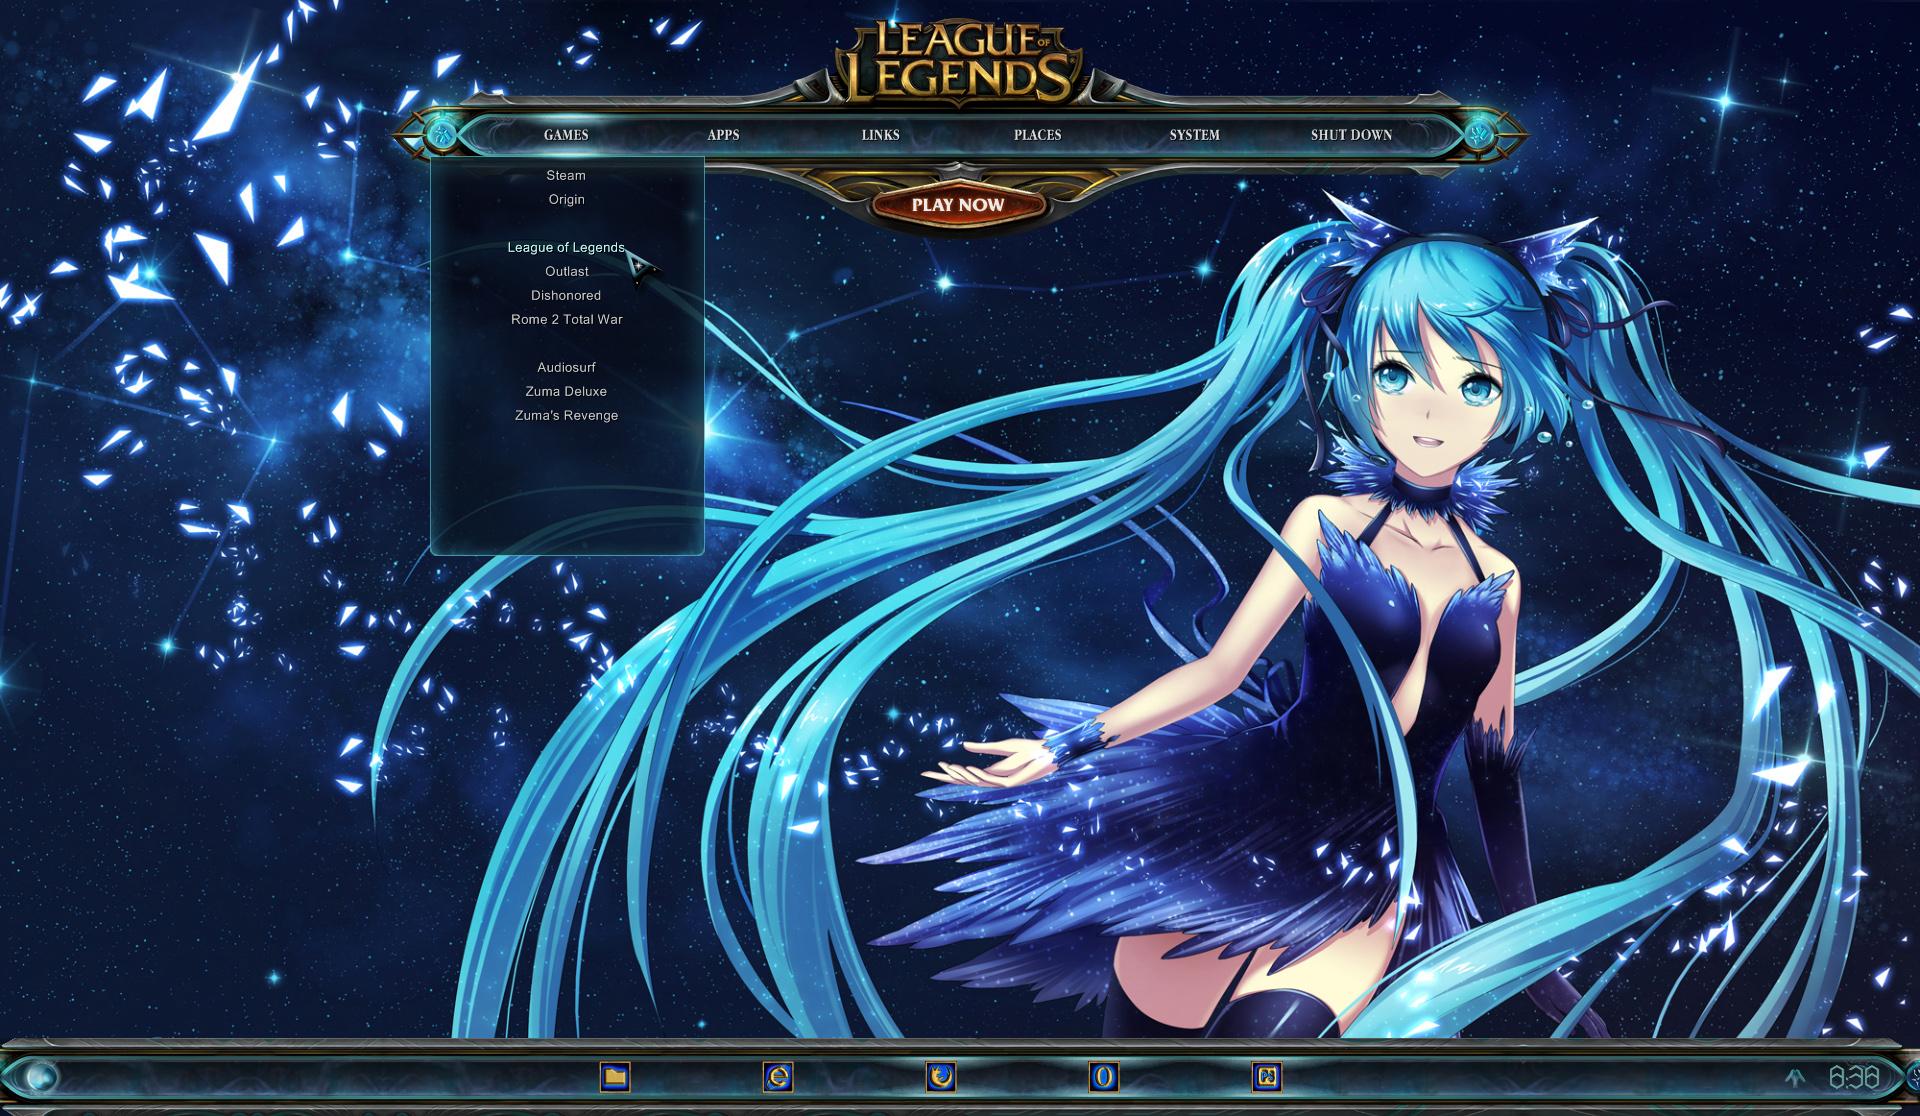 League of Legends Desktop by yorgash on DeviantArt